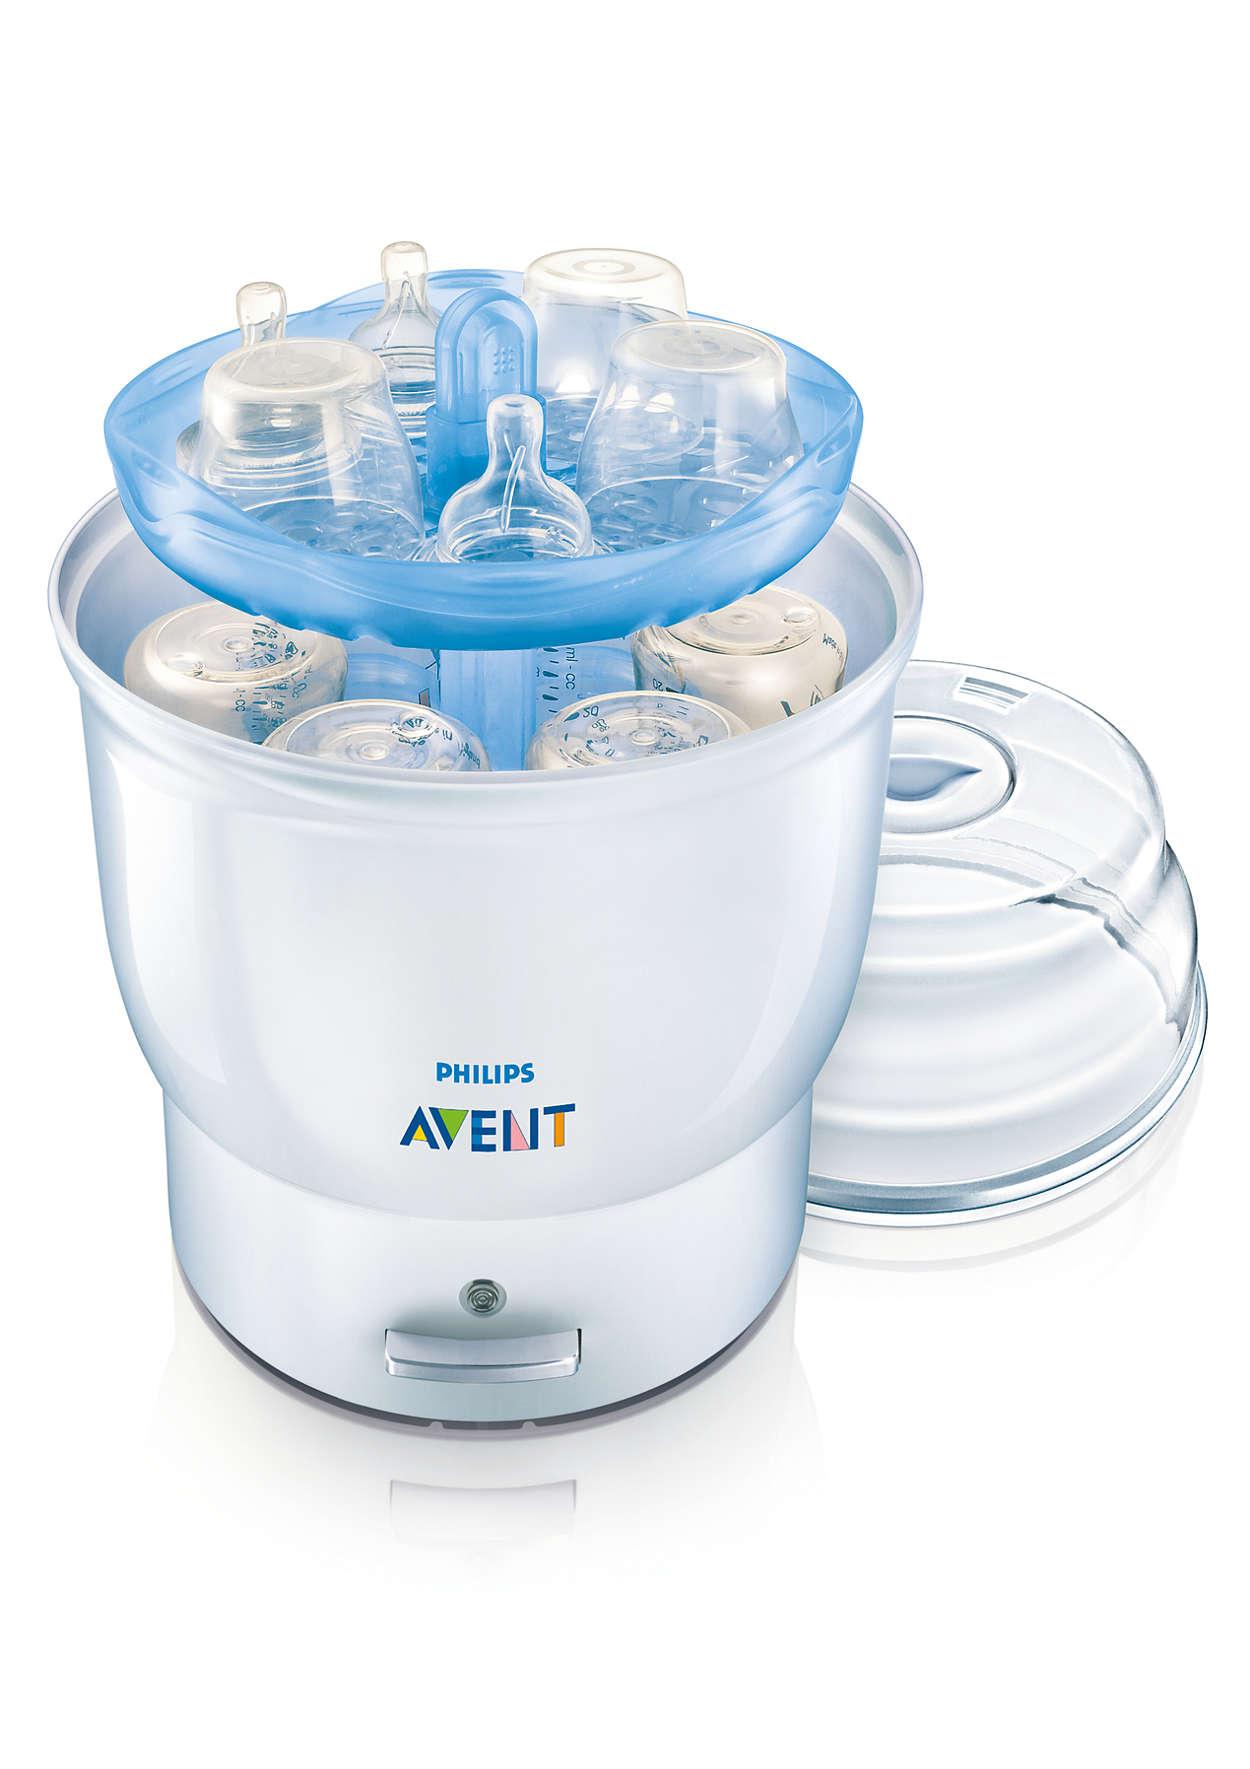 Steriliserer 6 flasker på 8 minutter